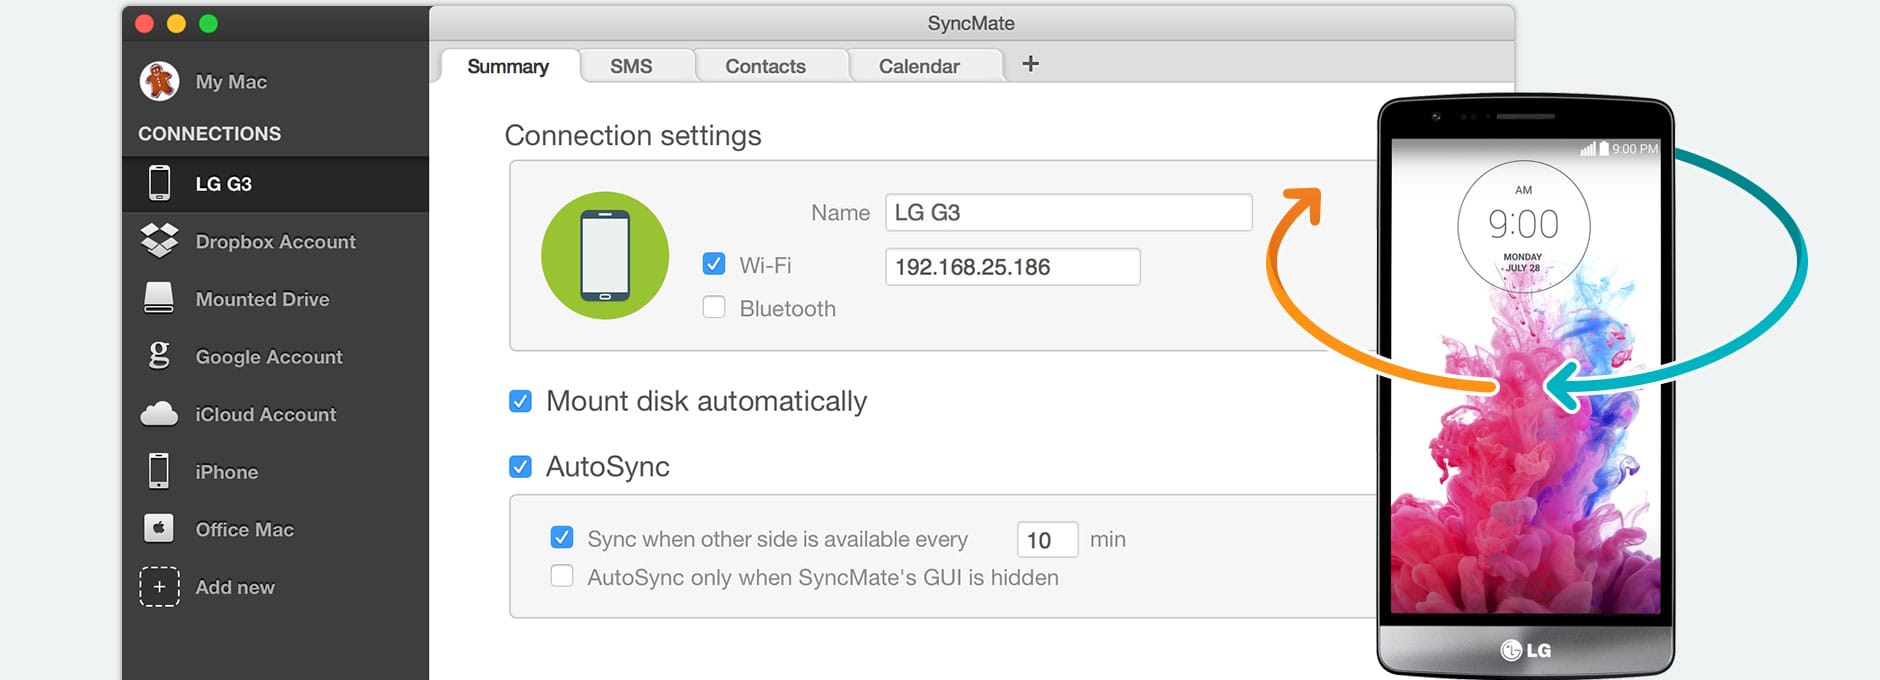 LG sync Mac: synchronize LG Mac with SyncMate, LG sync tool